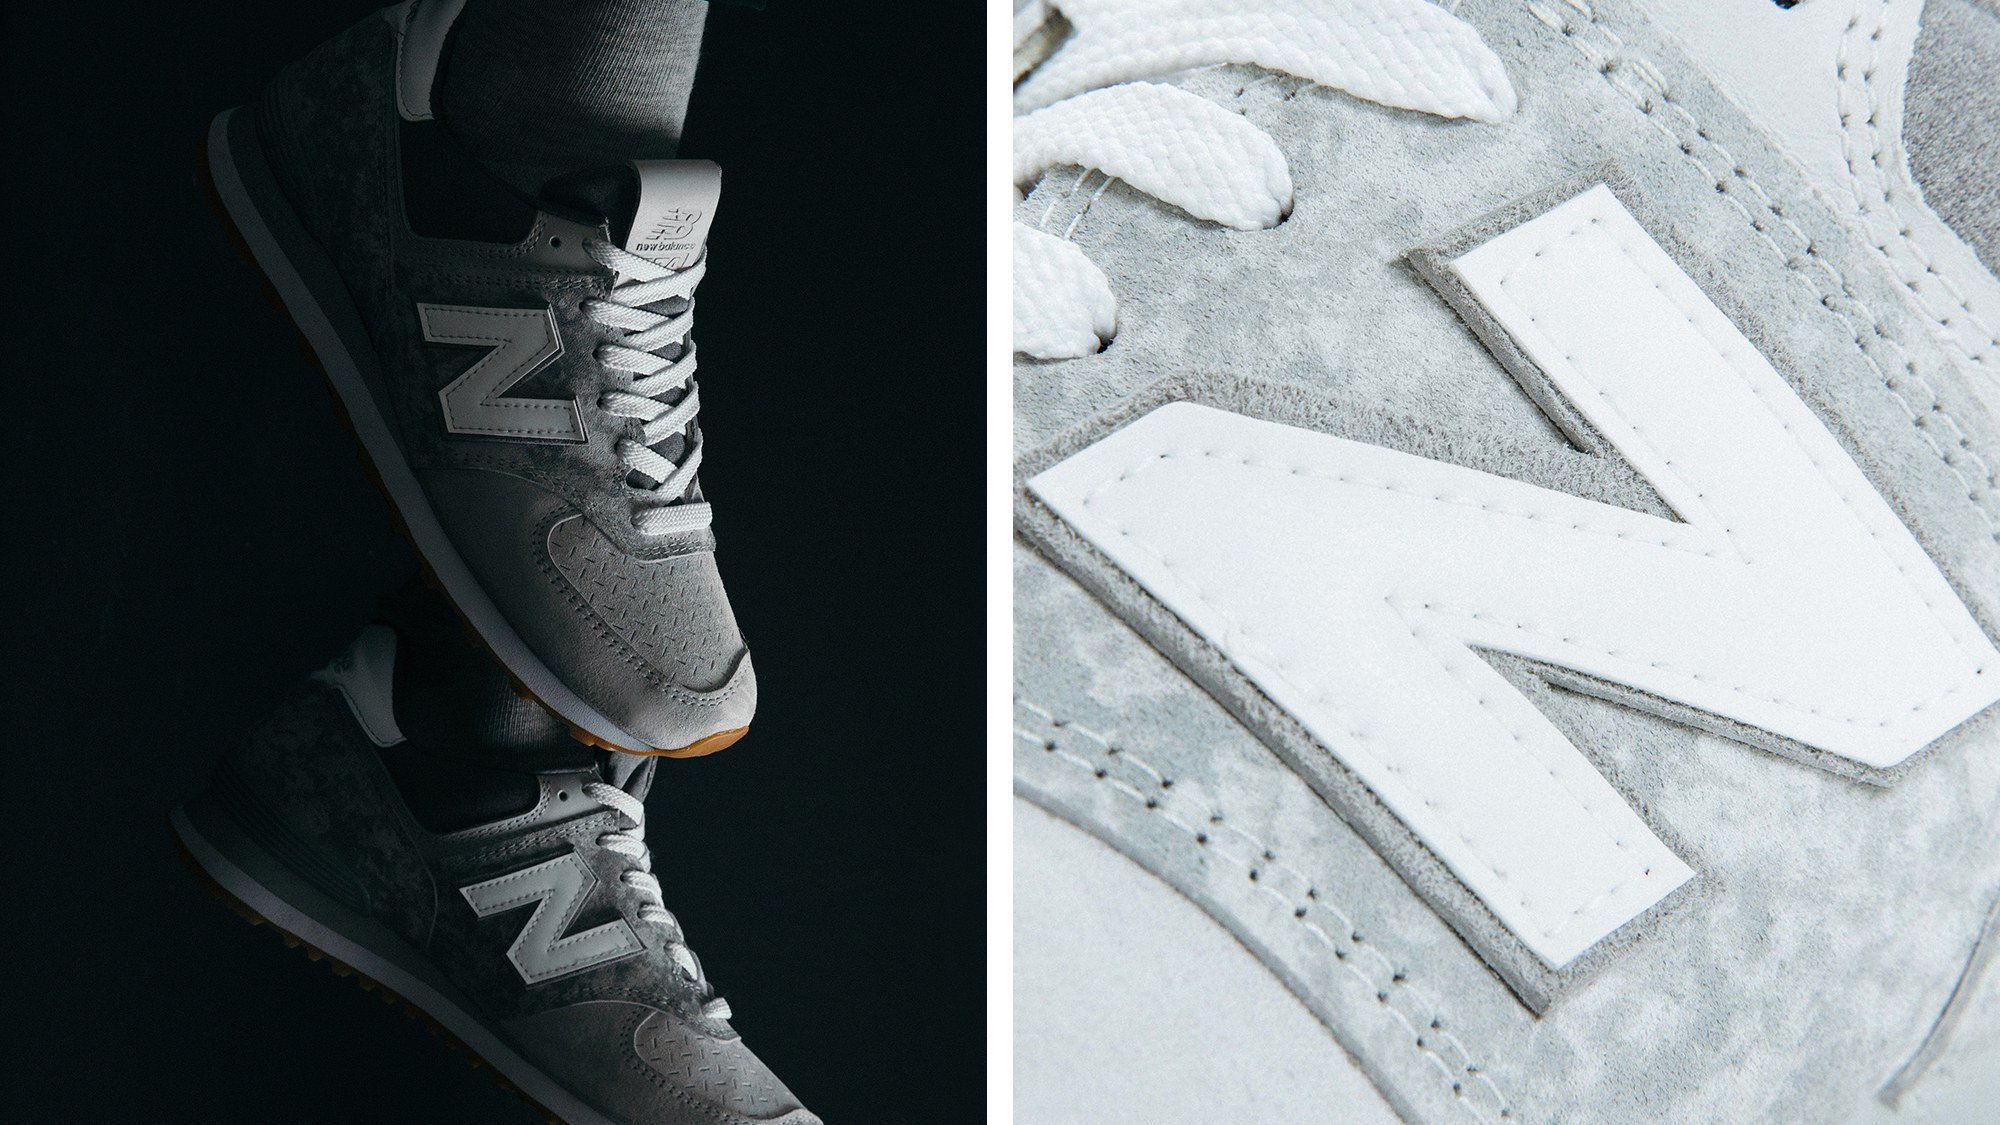 An old-school @NewBalance sneaker gets futurized https://t.co/OY0Uk7oSF0 https://t.co/6qOlPTiiZO